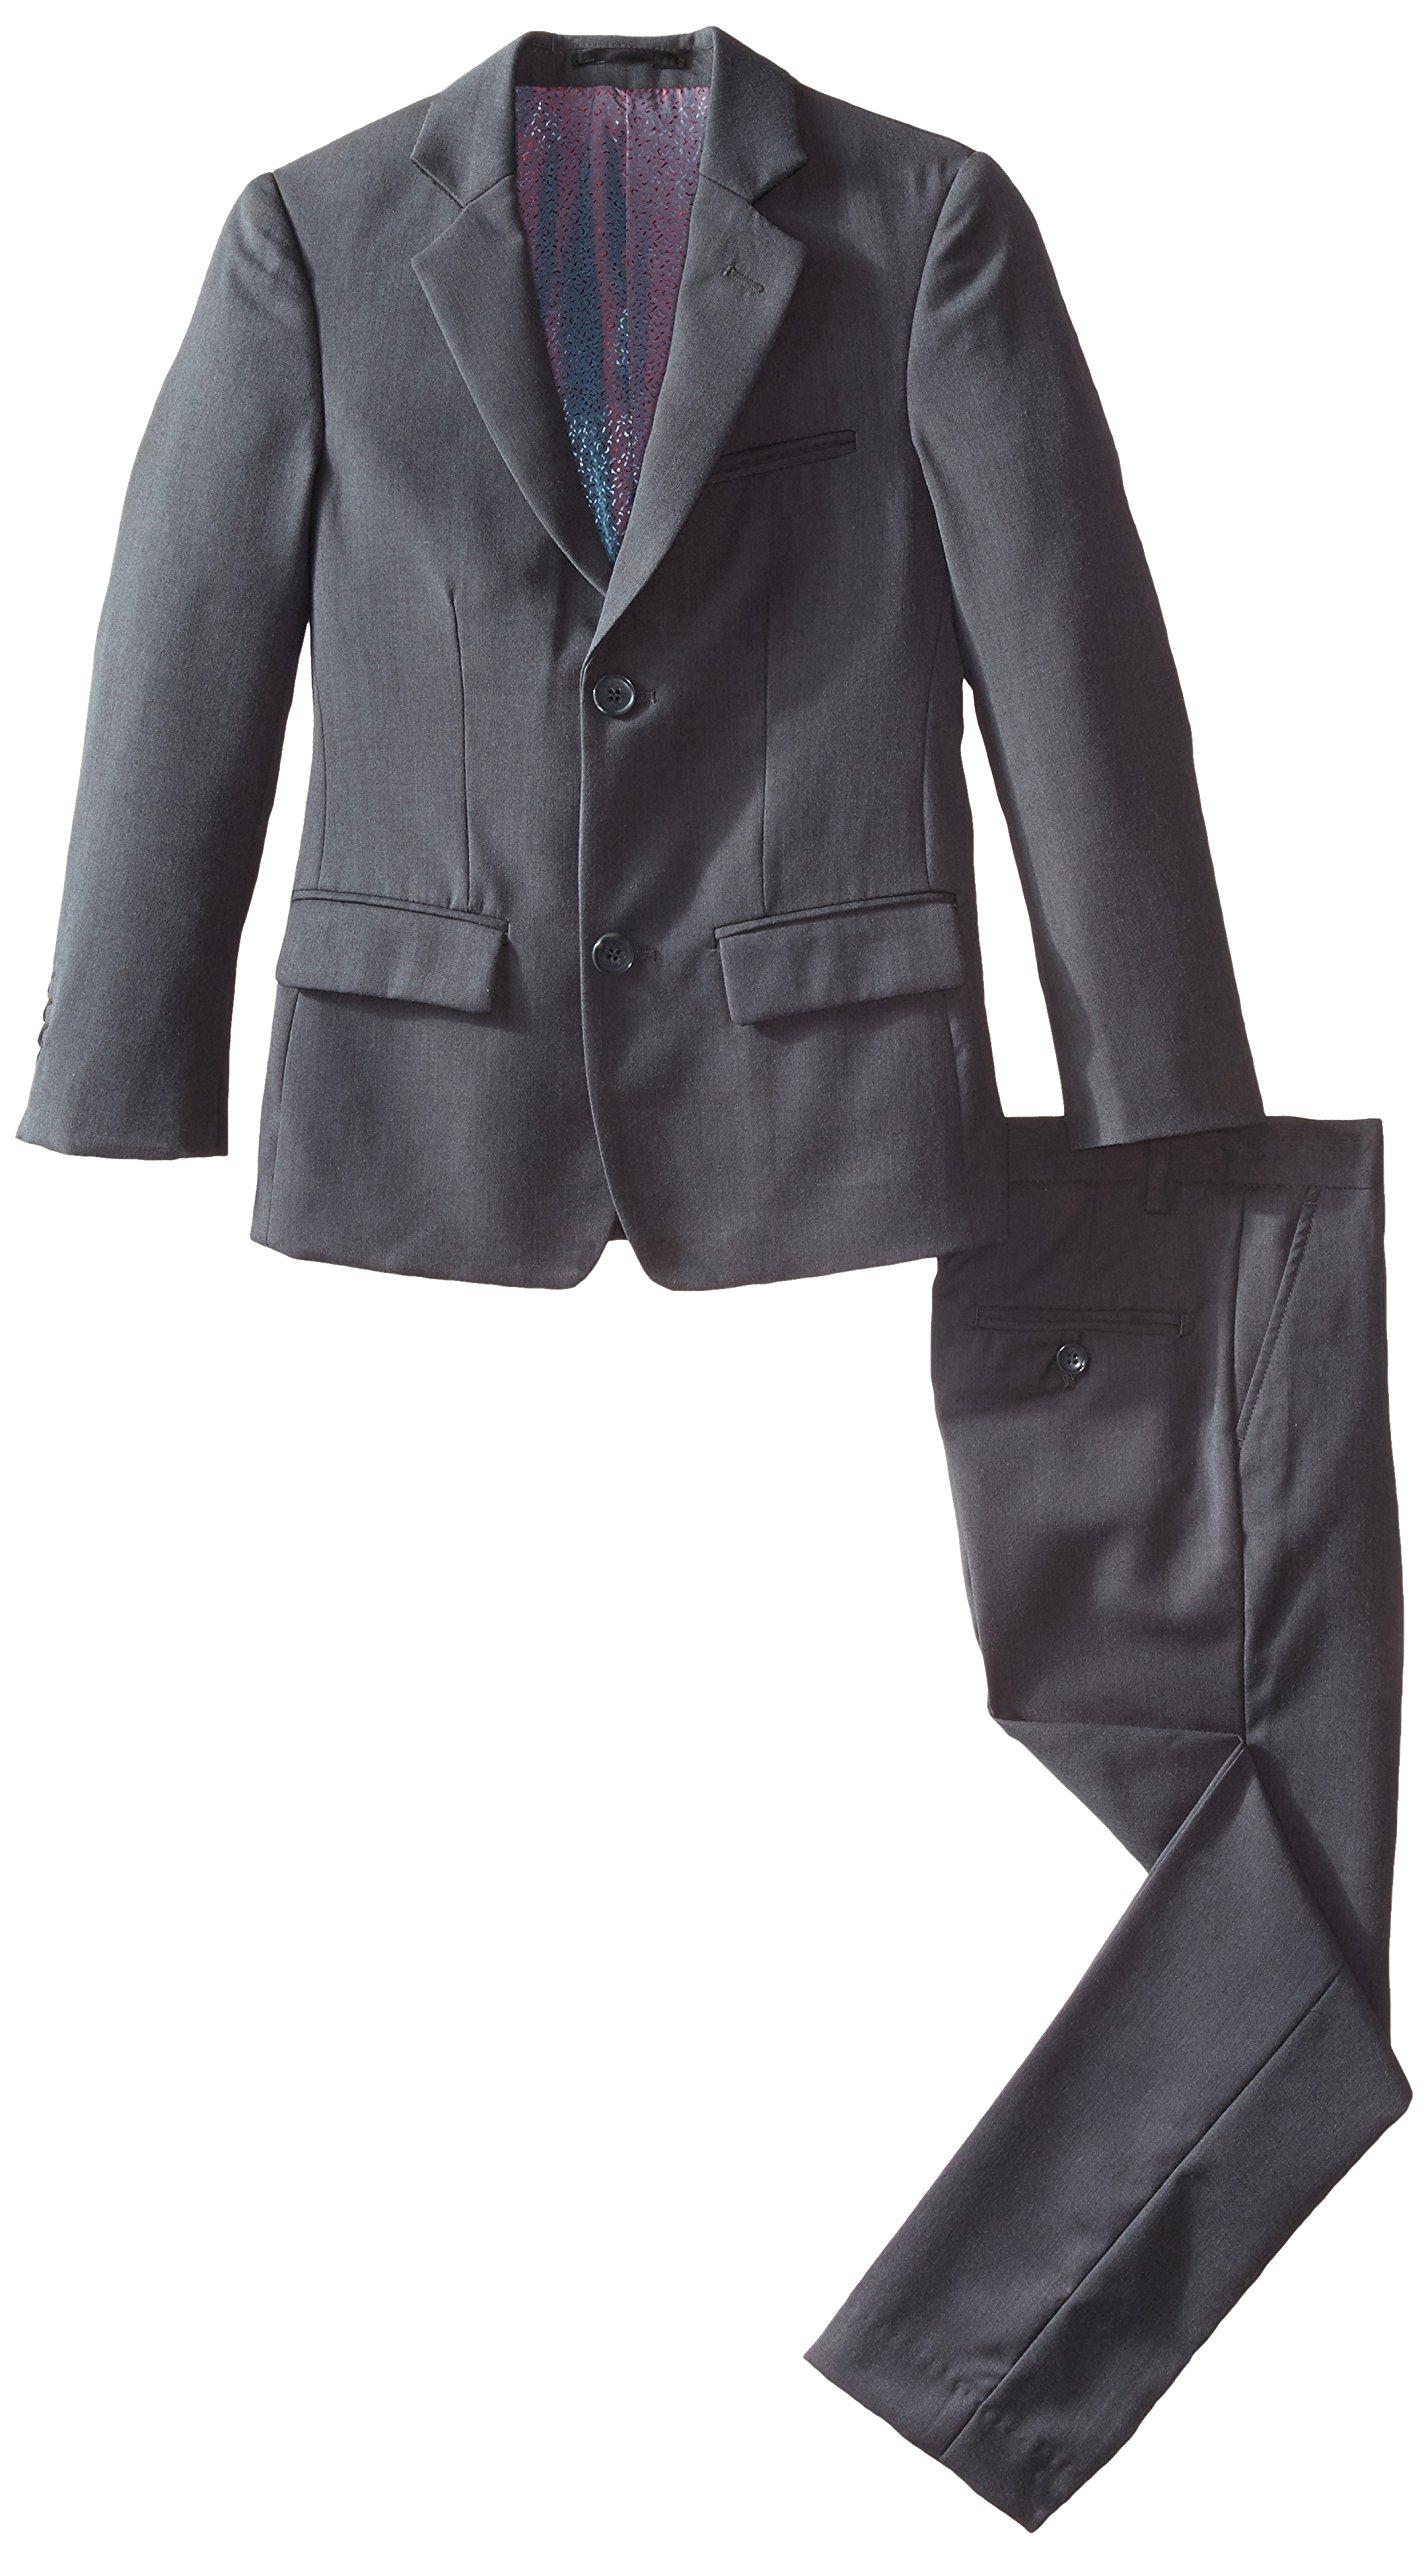 Isaac Mizrahi Big Boys' Slim Boys 2 Piece Cut Linen/Cotton Suit, Dark Grey, 18